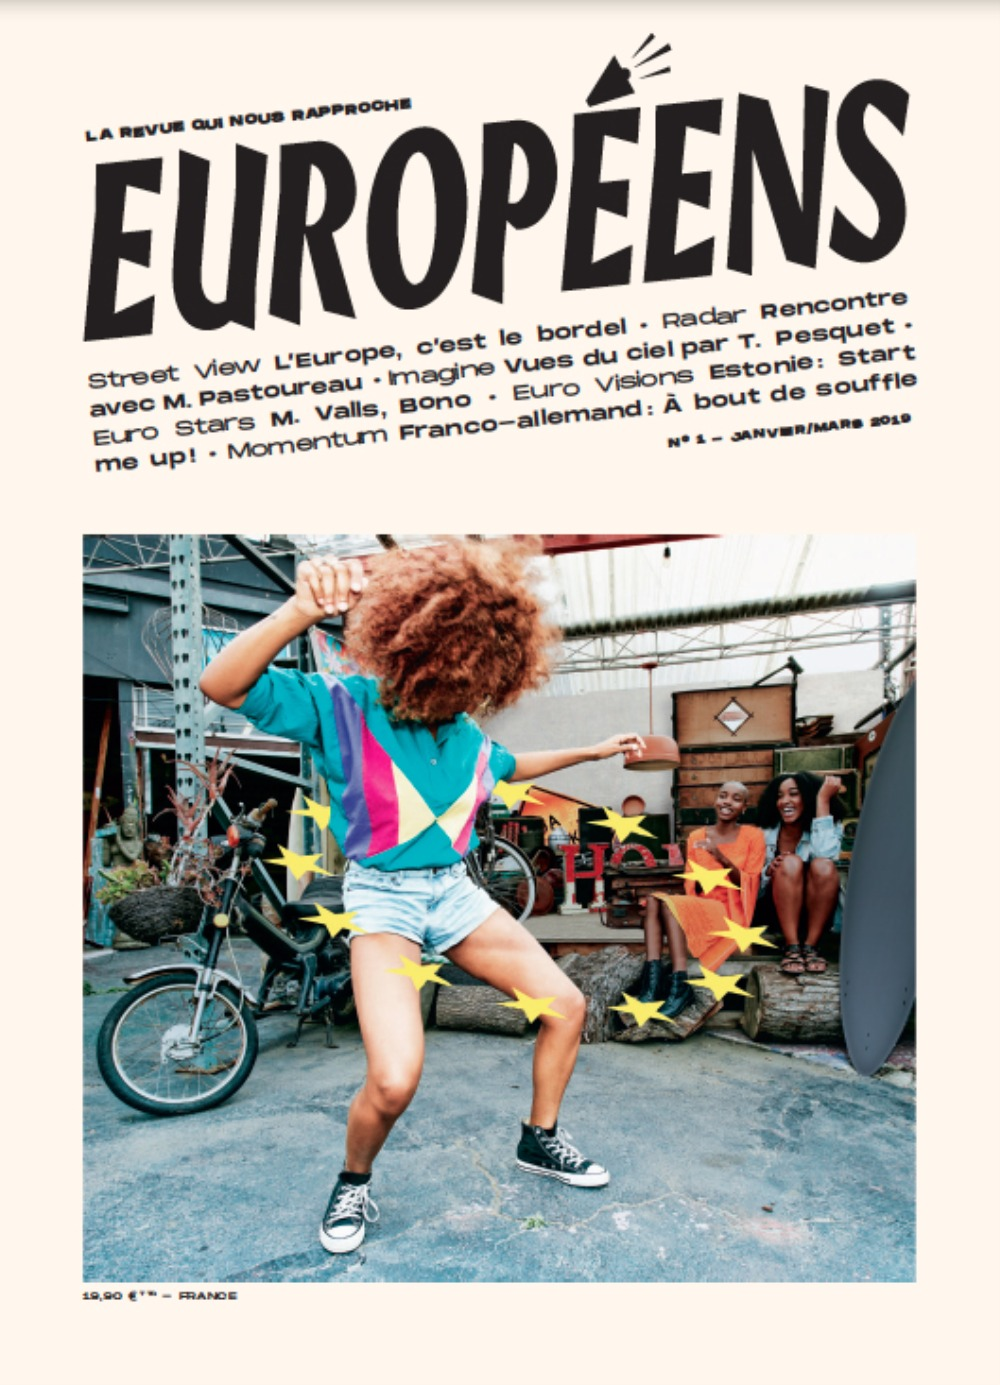 EUROPEENS